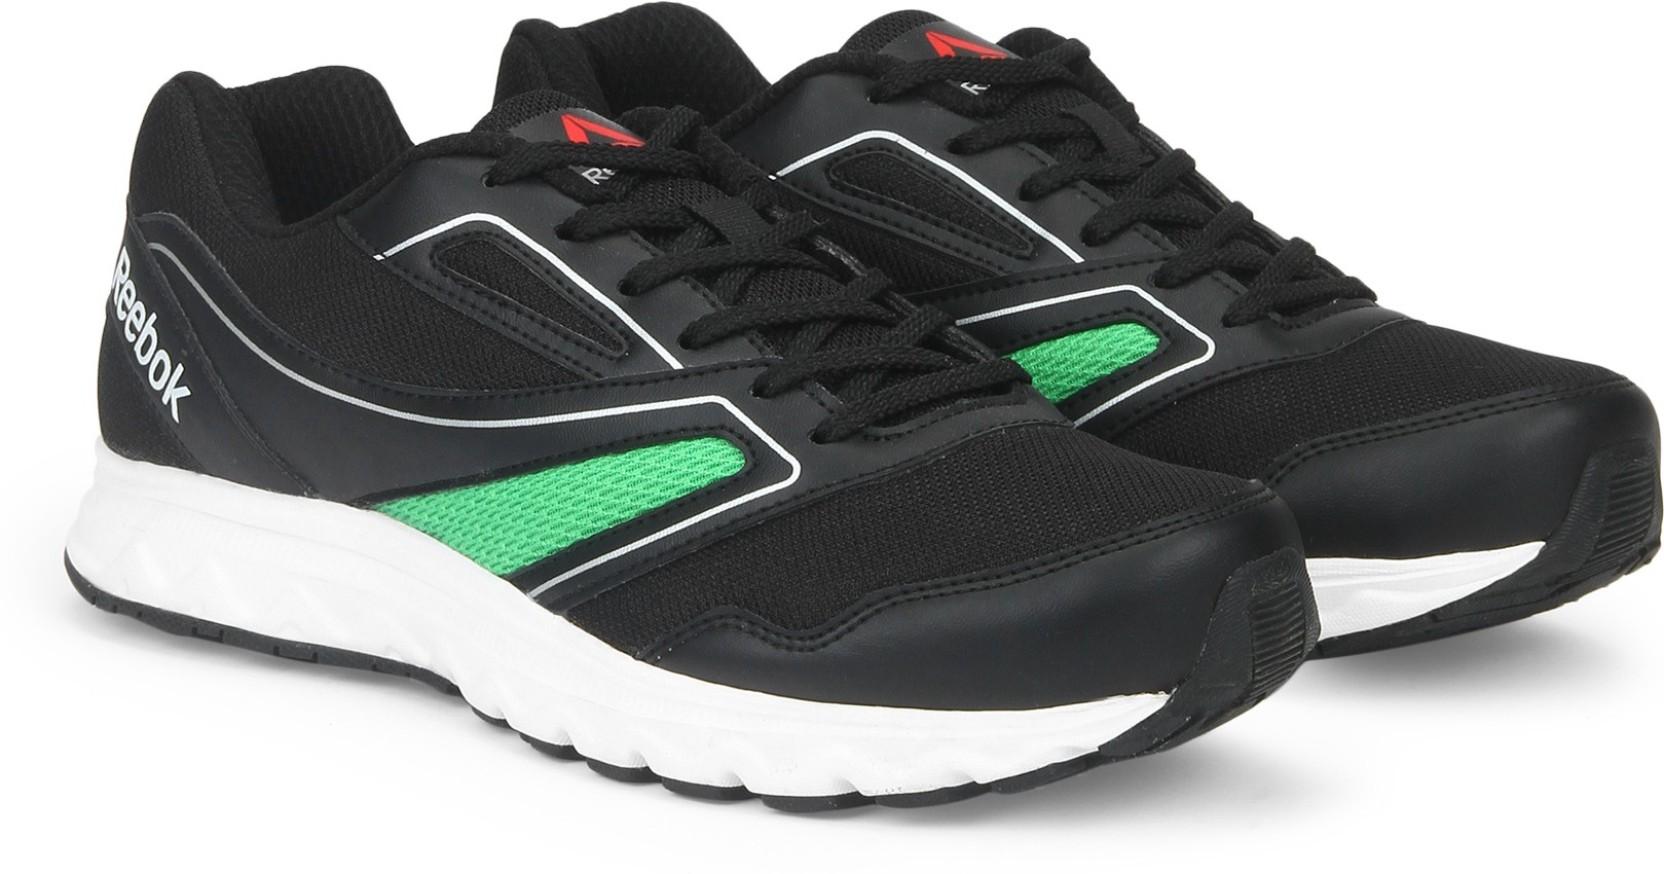 accf4c0853f REEBOK EXPLORE RUN Running Shoes For Men - Buy BLACK BRT GRN MET SIL ...